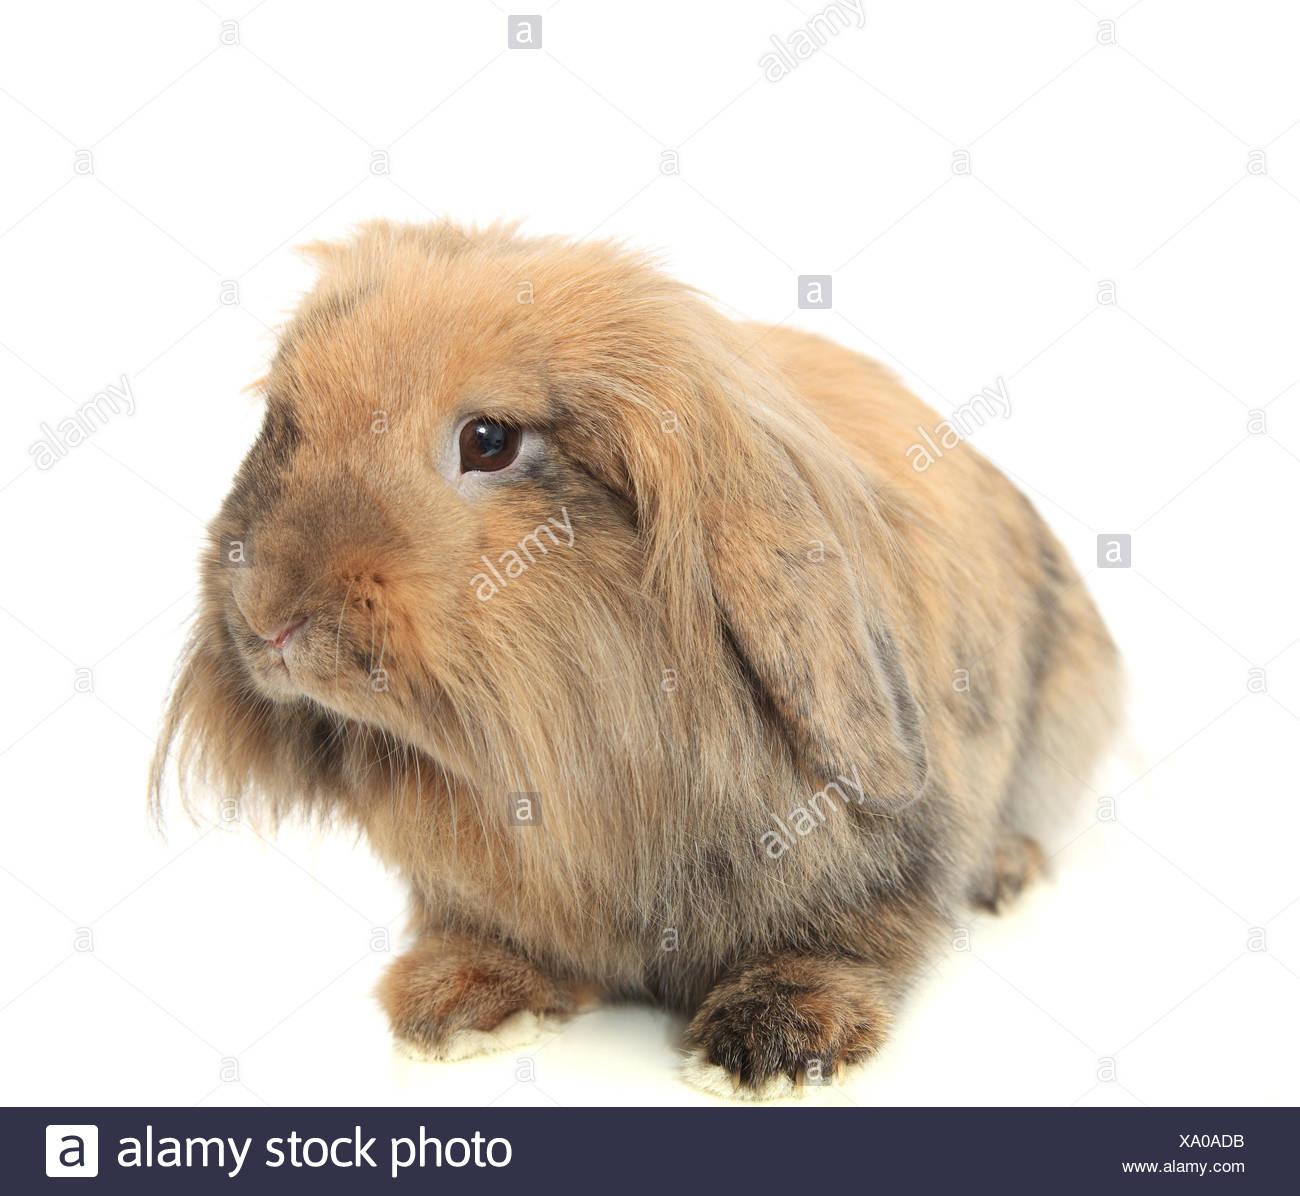 Brown rabbit - Stock Image